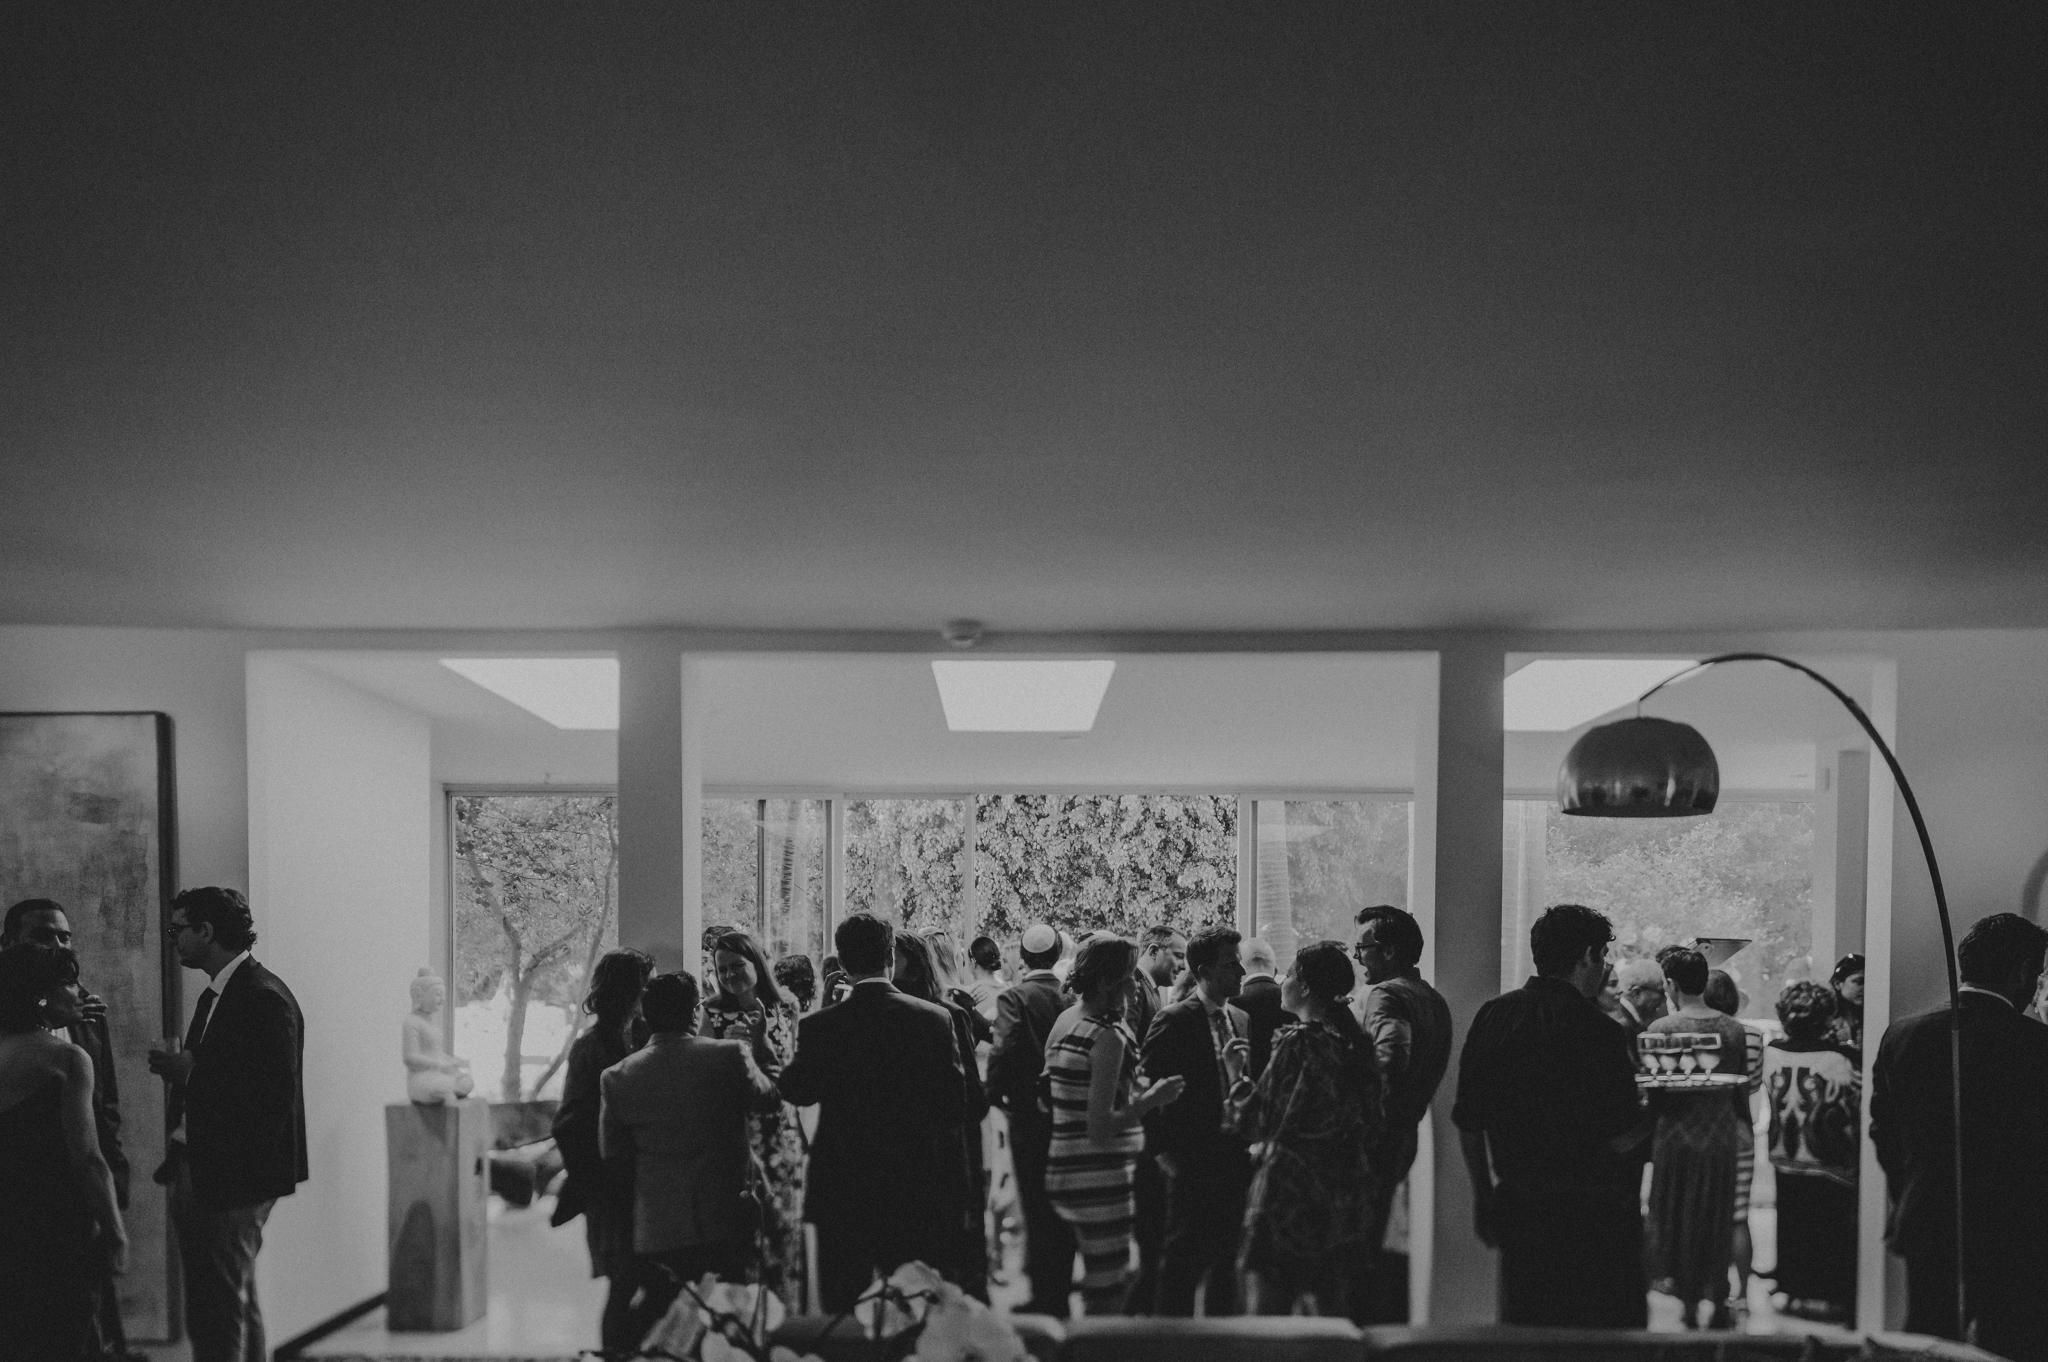 Isaiah + Taylor Photography - Private Estate Backyard Wedding - Beverly Hills - Los Angeles Wedding Photographer - 85.jpg